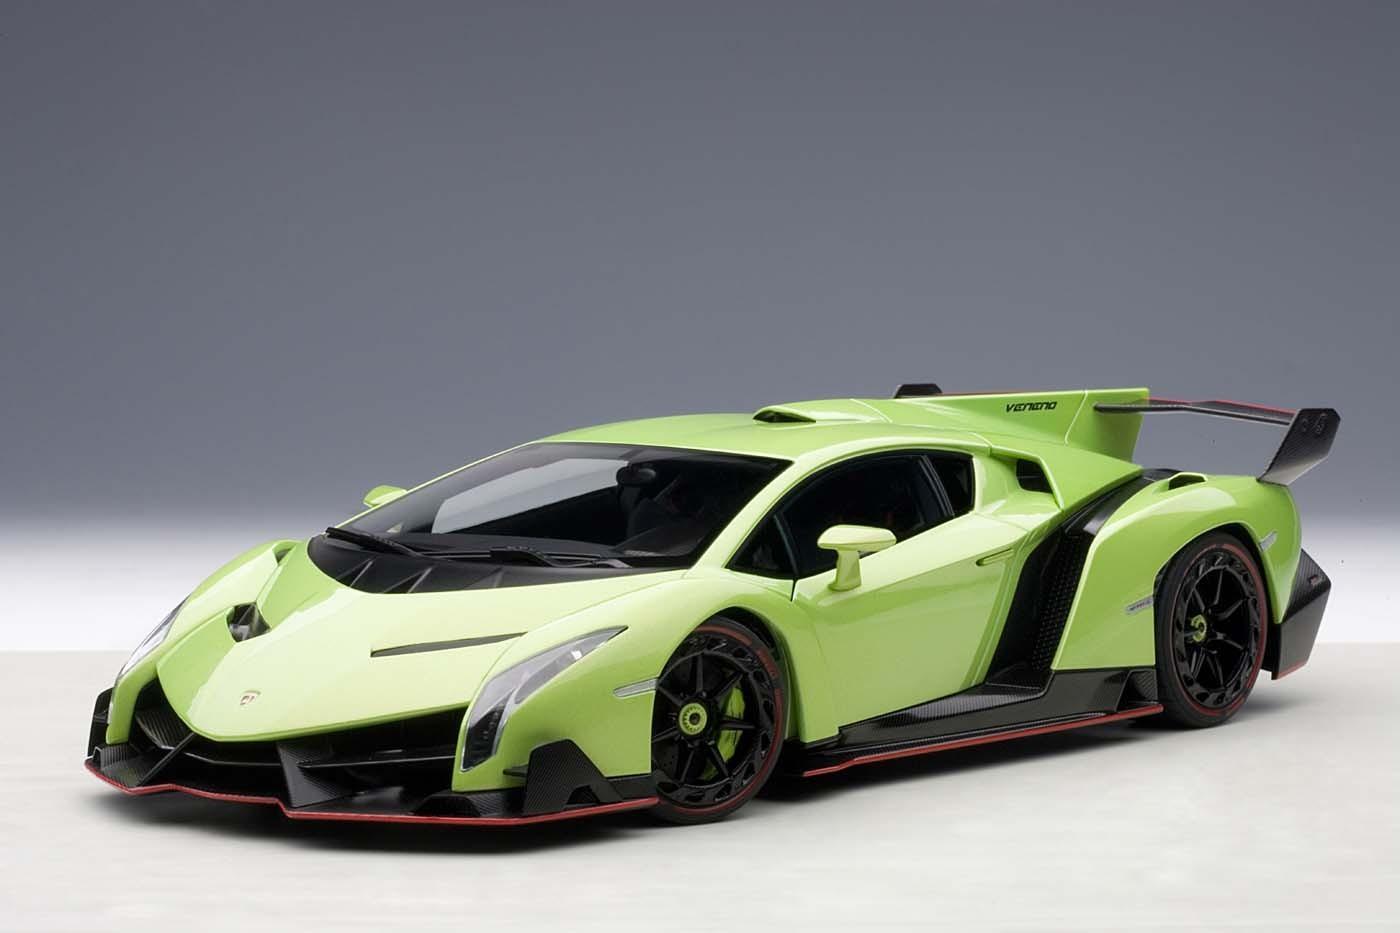 Autoart Highly Detailed Die Cast Model Green Lamborghini Veneno 74509 1 18 Scale Item Au74509